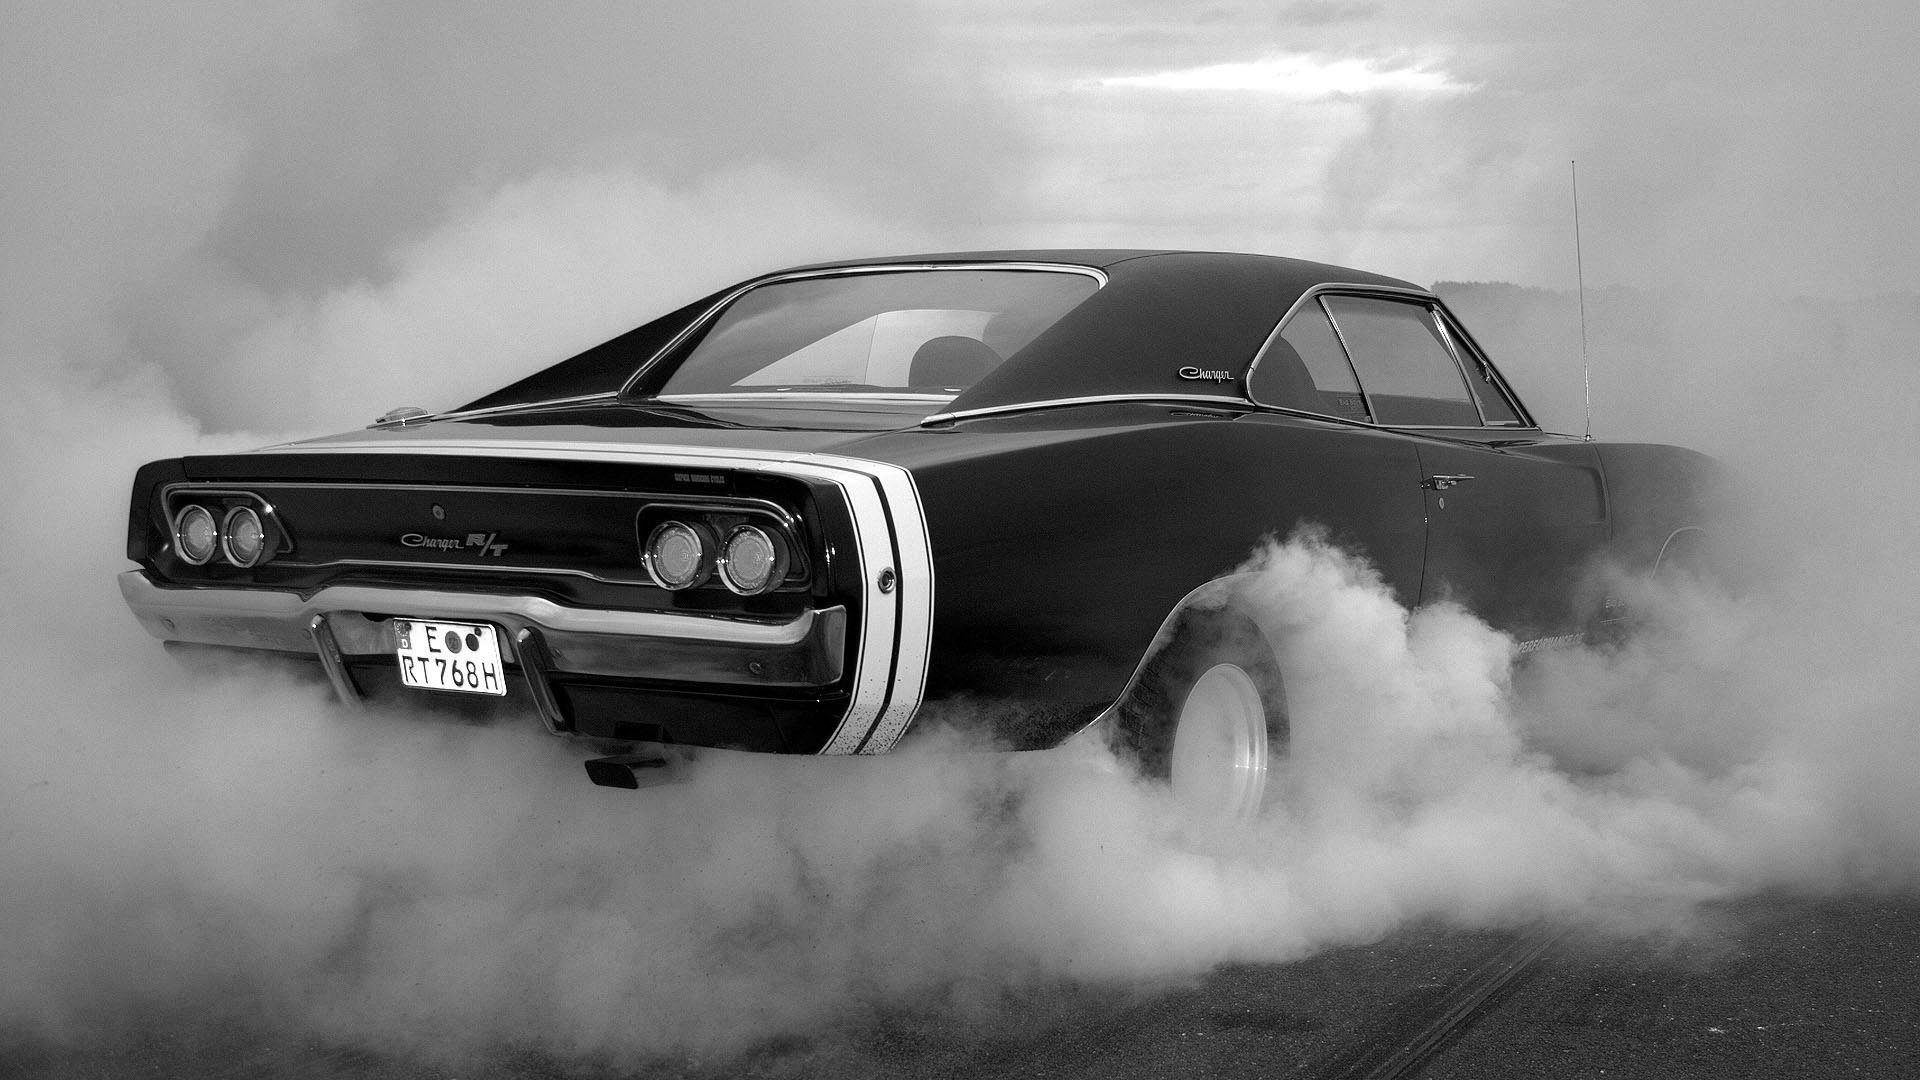 Muscle car burnout wallpaper 1920x1080 HQ WALLPAPER - (#35283)